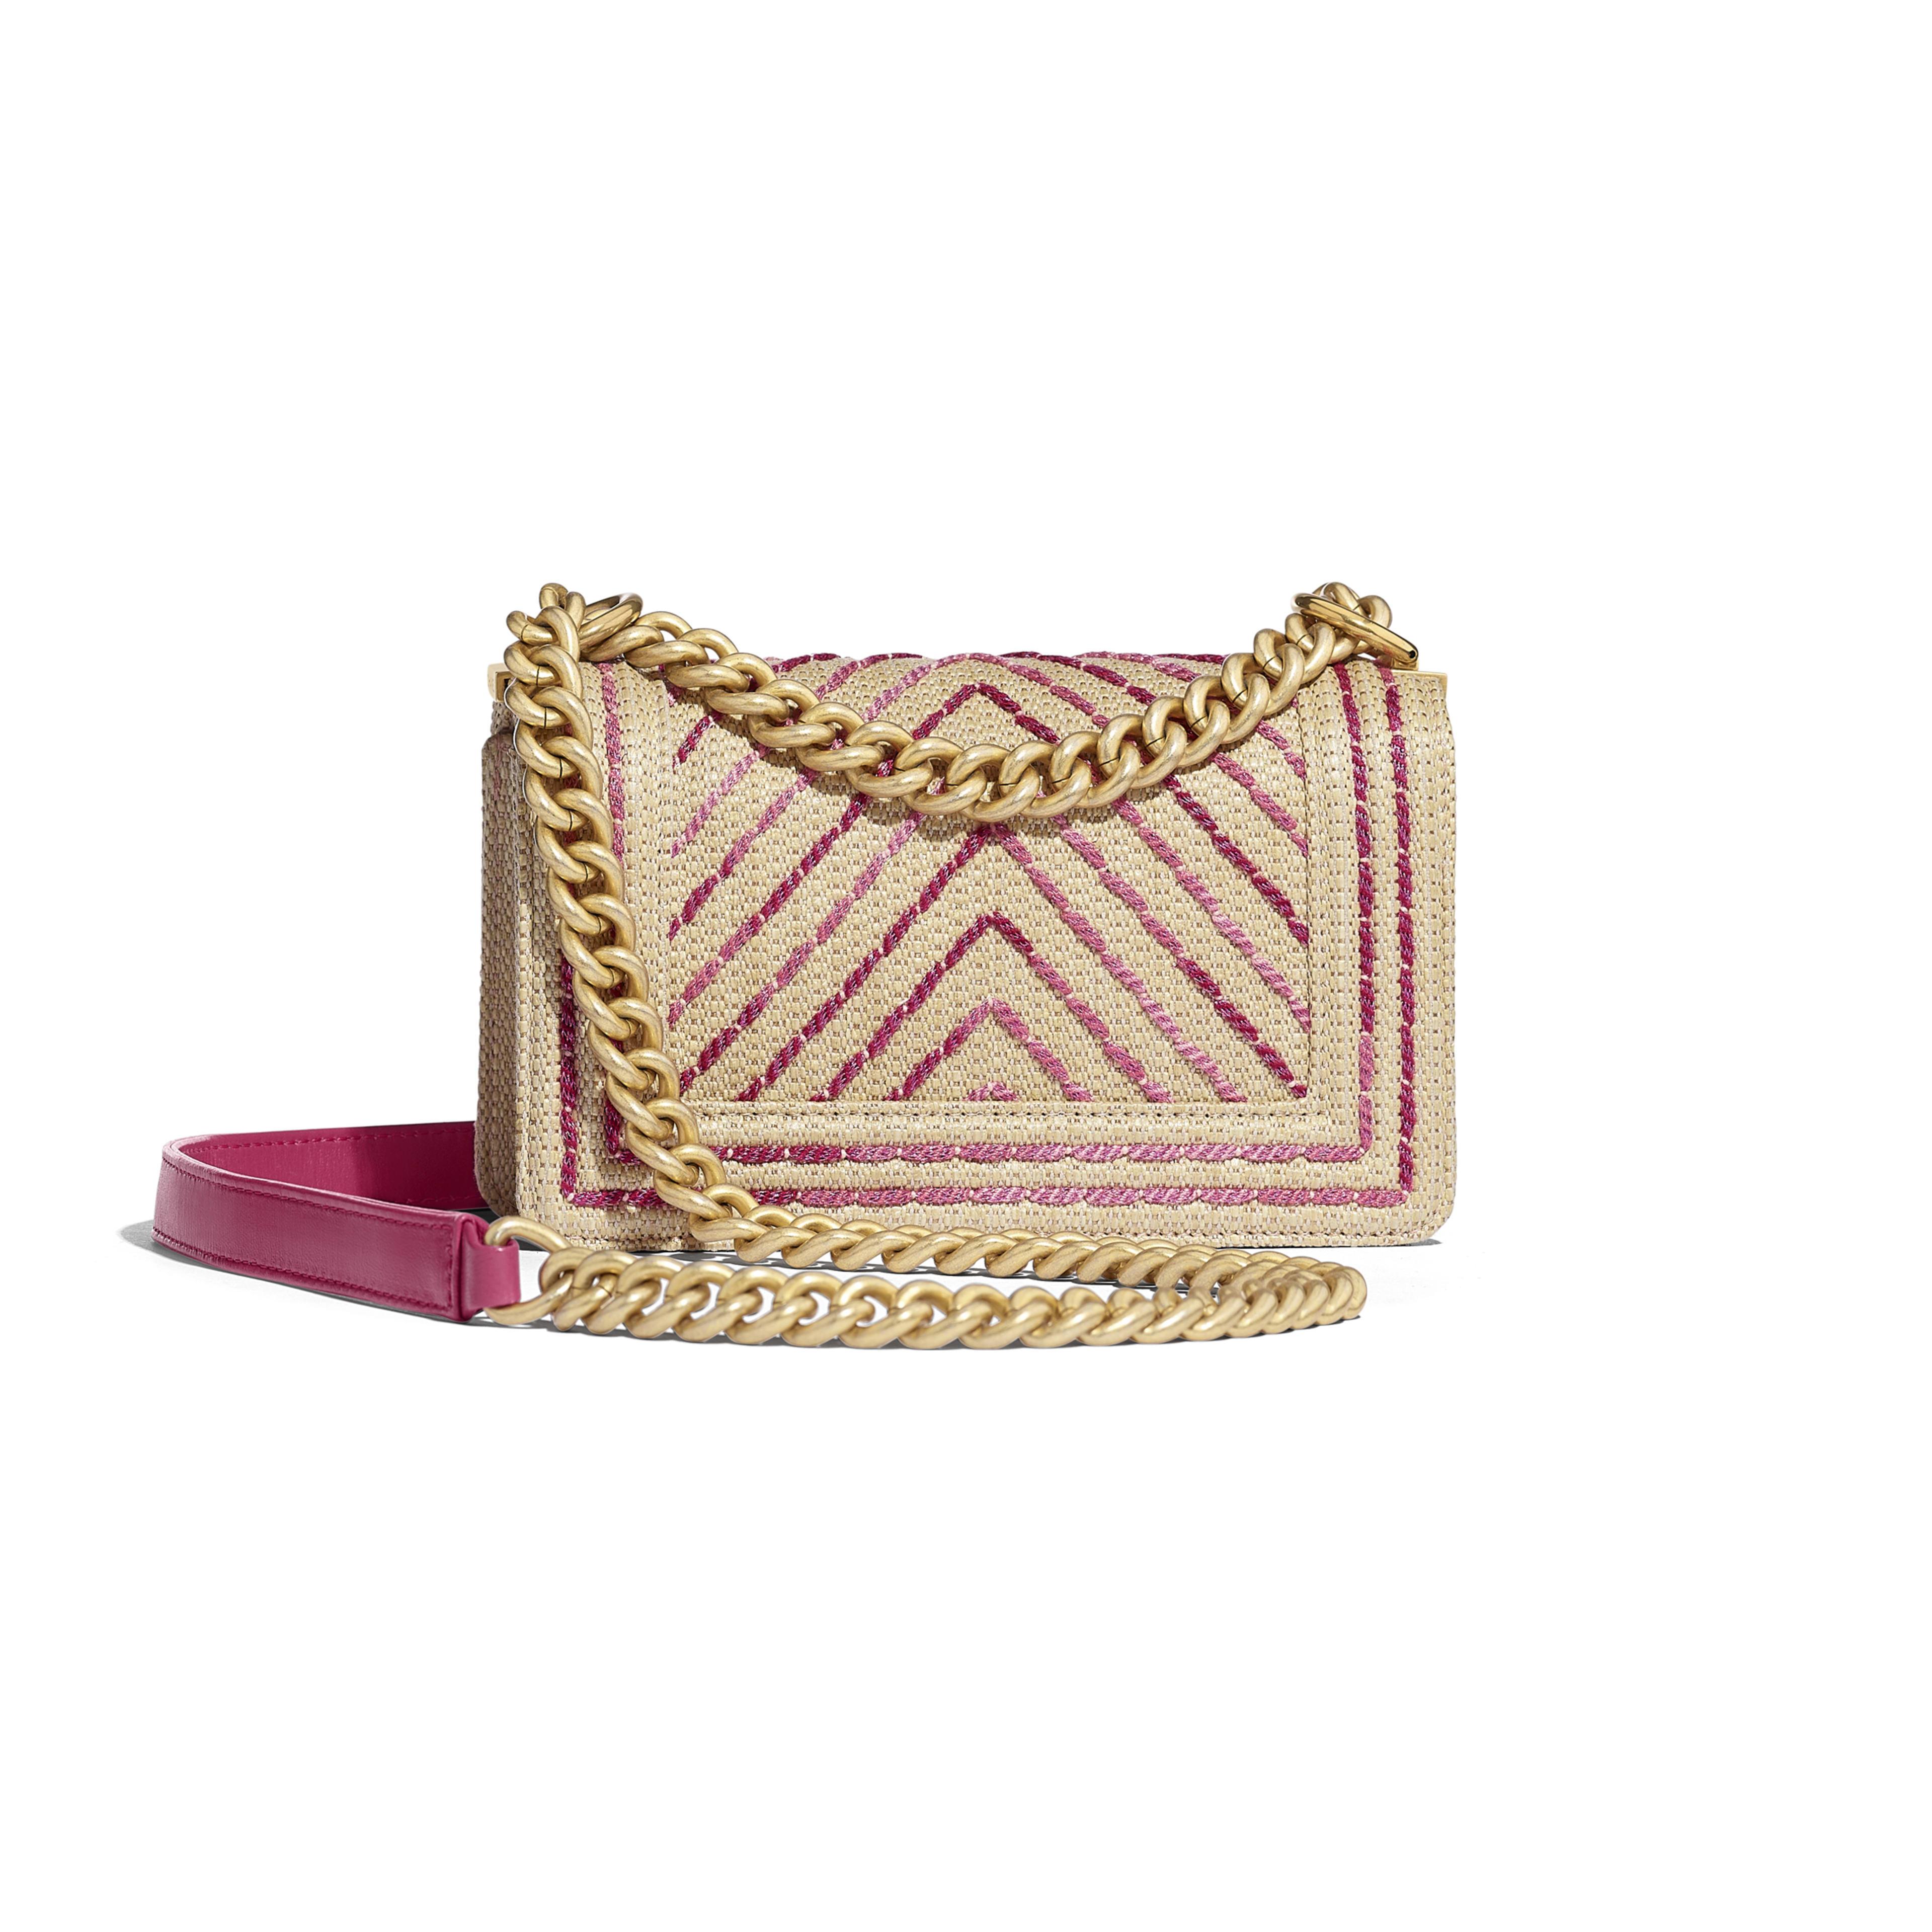 Small BOY CHANEL Handbag - Beige & Pink - Cotton, Mixed Fibers, Calfskin & Gold-Tone Metal - Alternative view - see full sized version